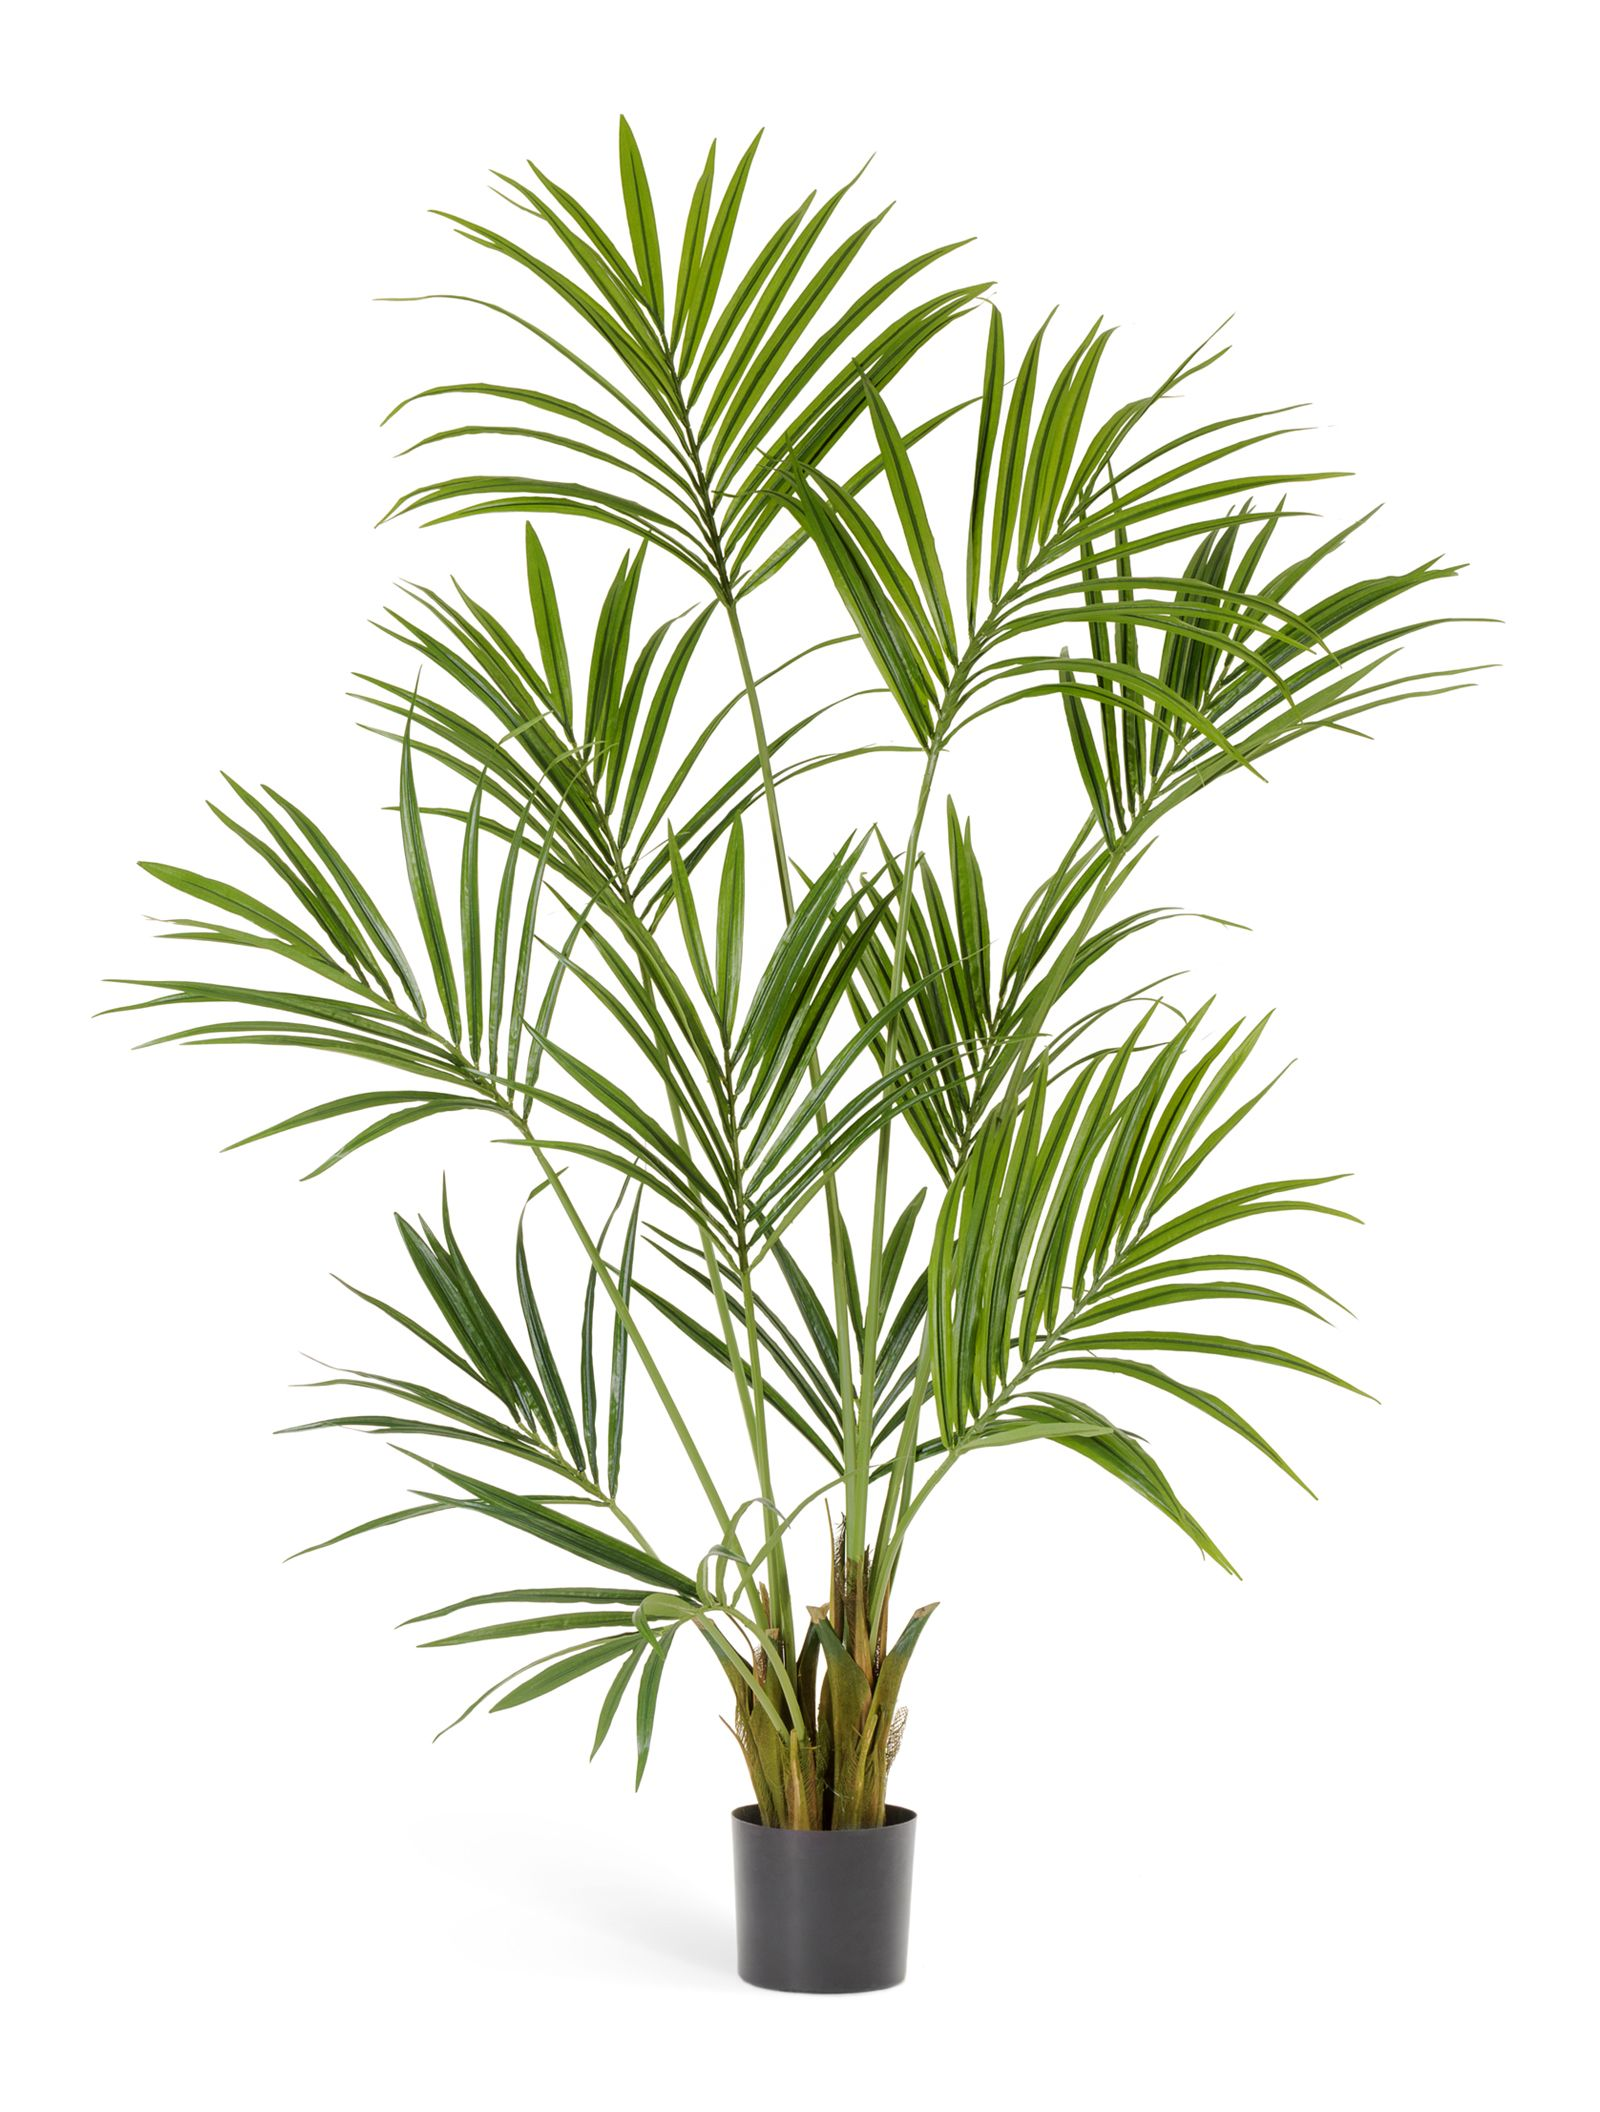 Домашняя пальма цветок в картинках